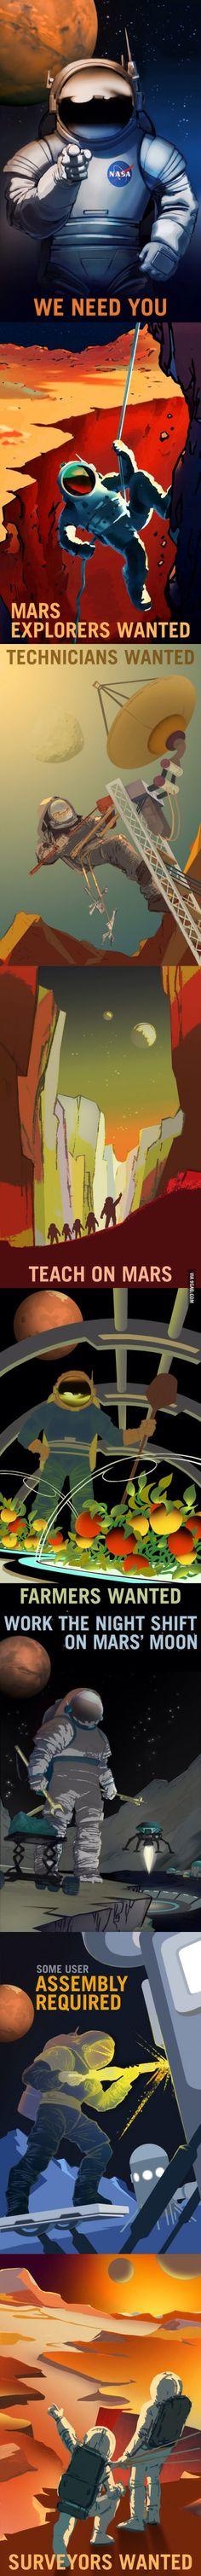 New NASA's Mars posters